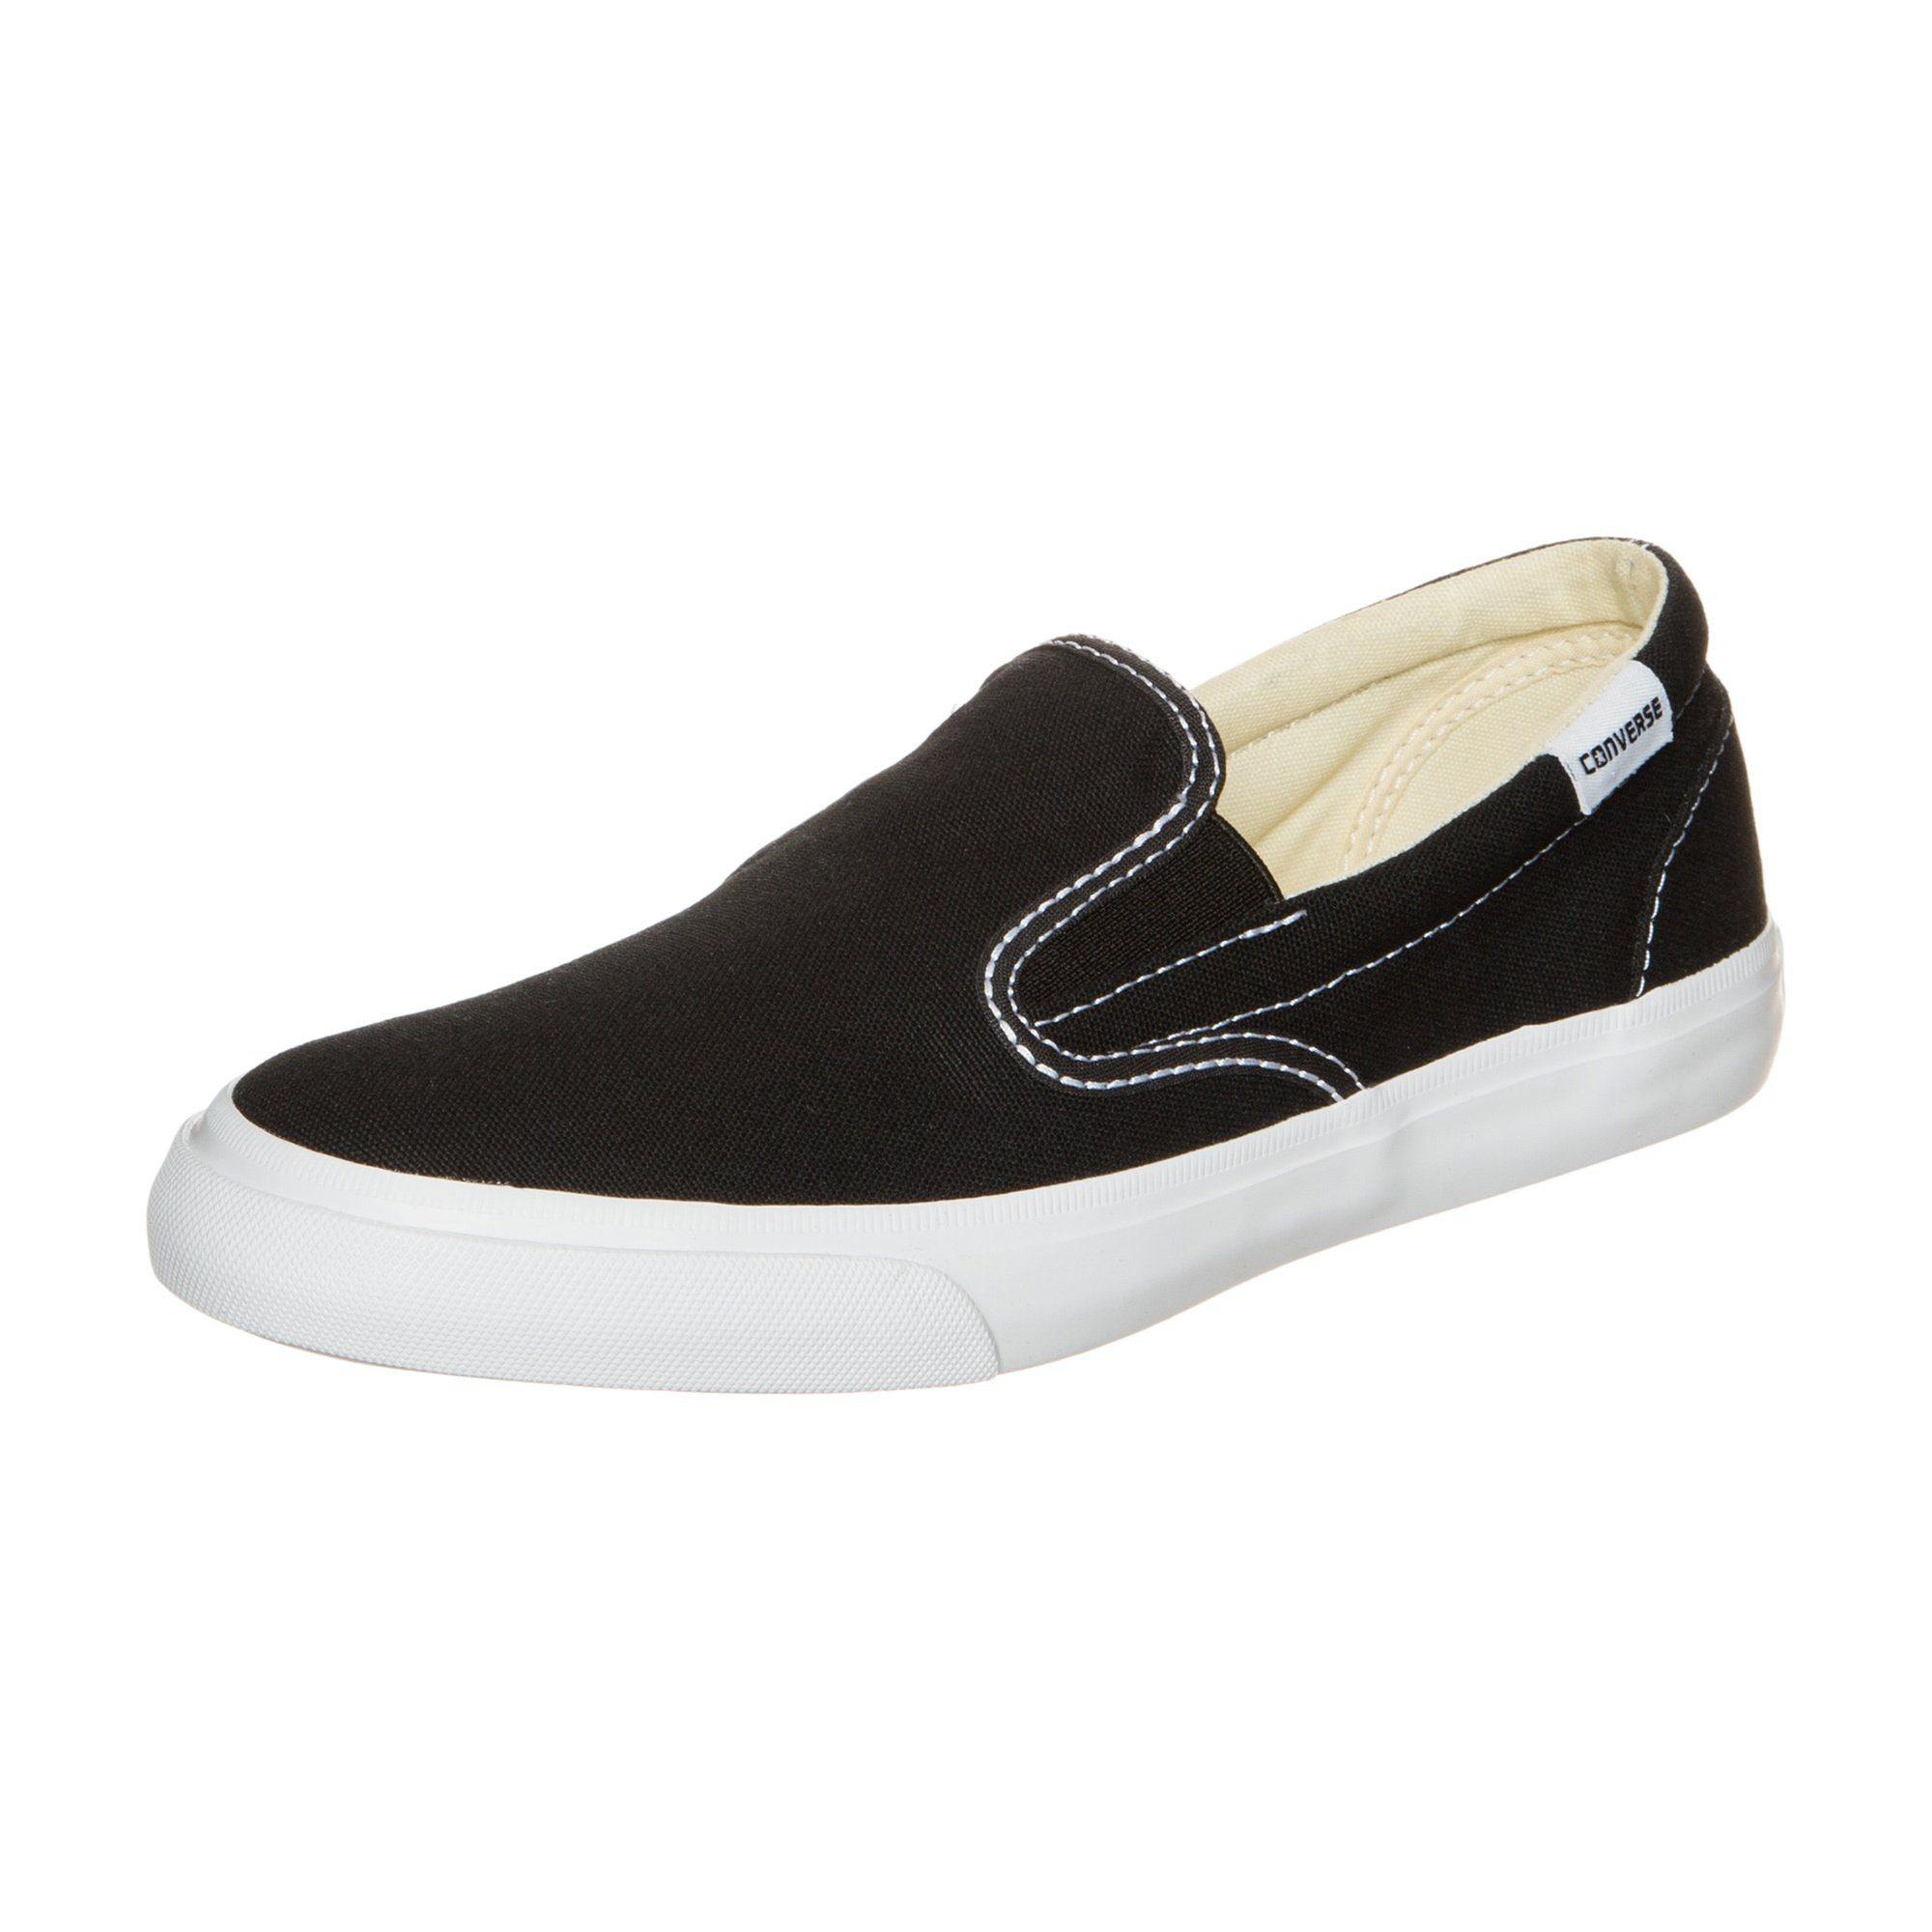 3b7e43b4919 Bildquelle: Converse Chuck Taylor All Star Core Slip OX Sneaker Kinder